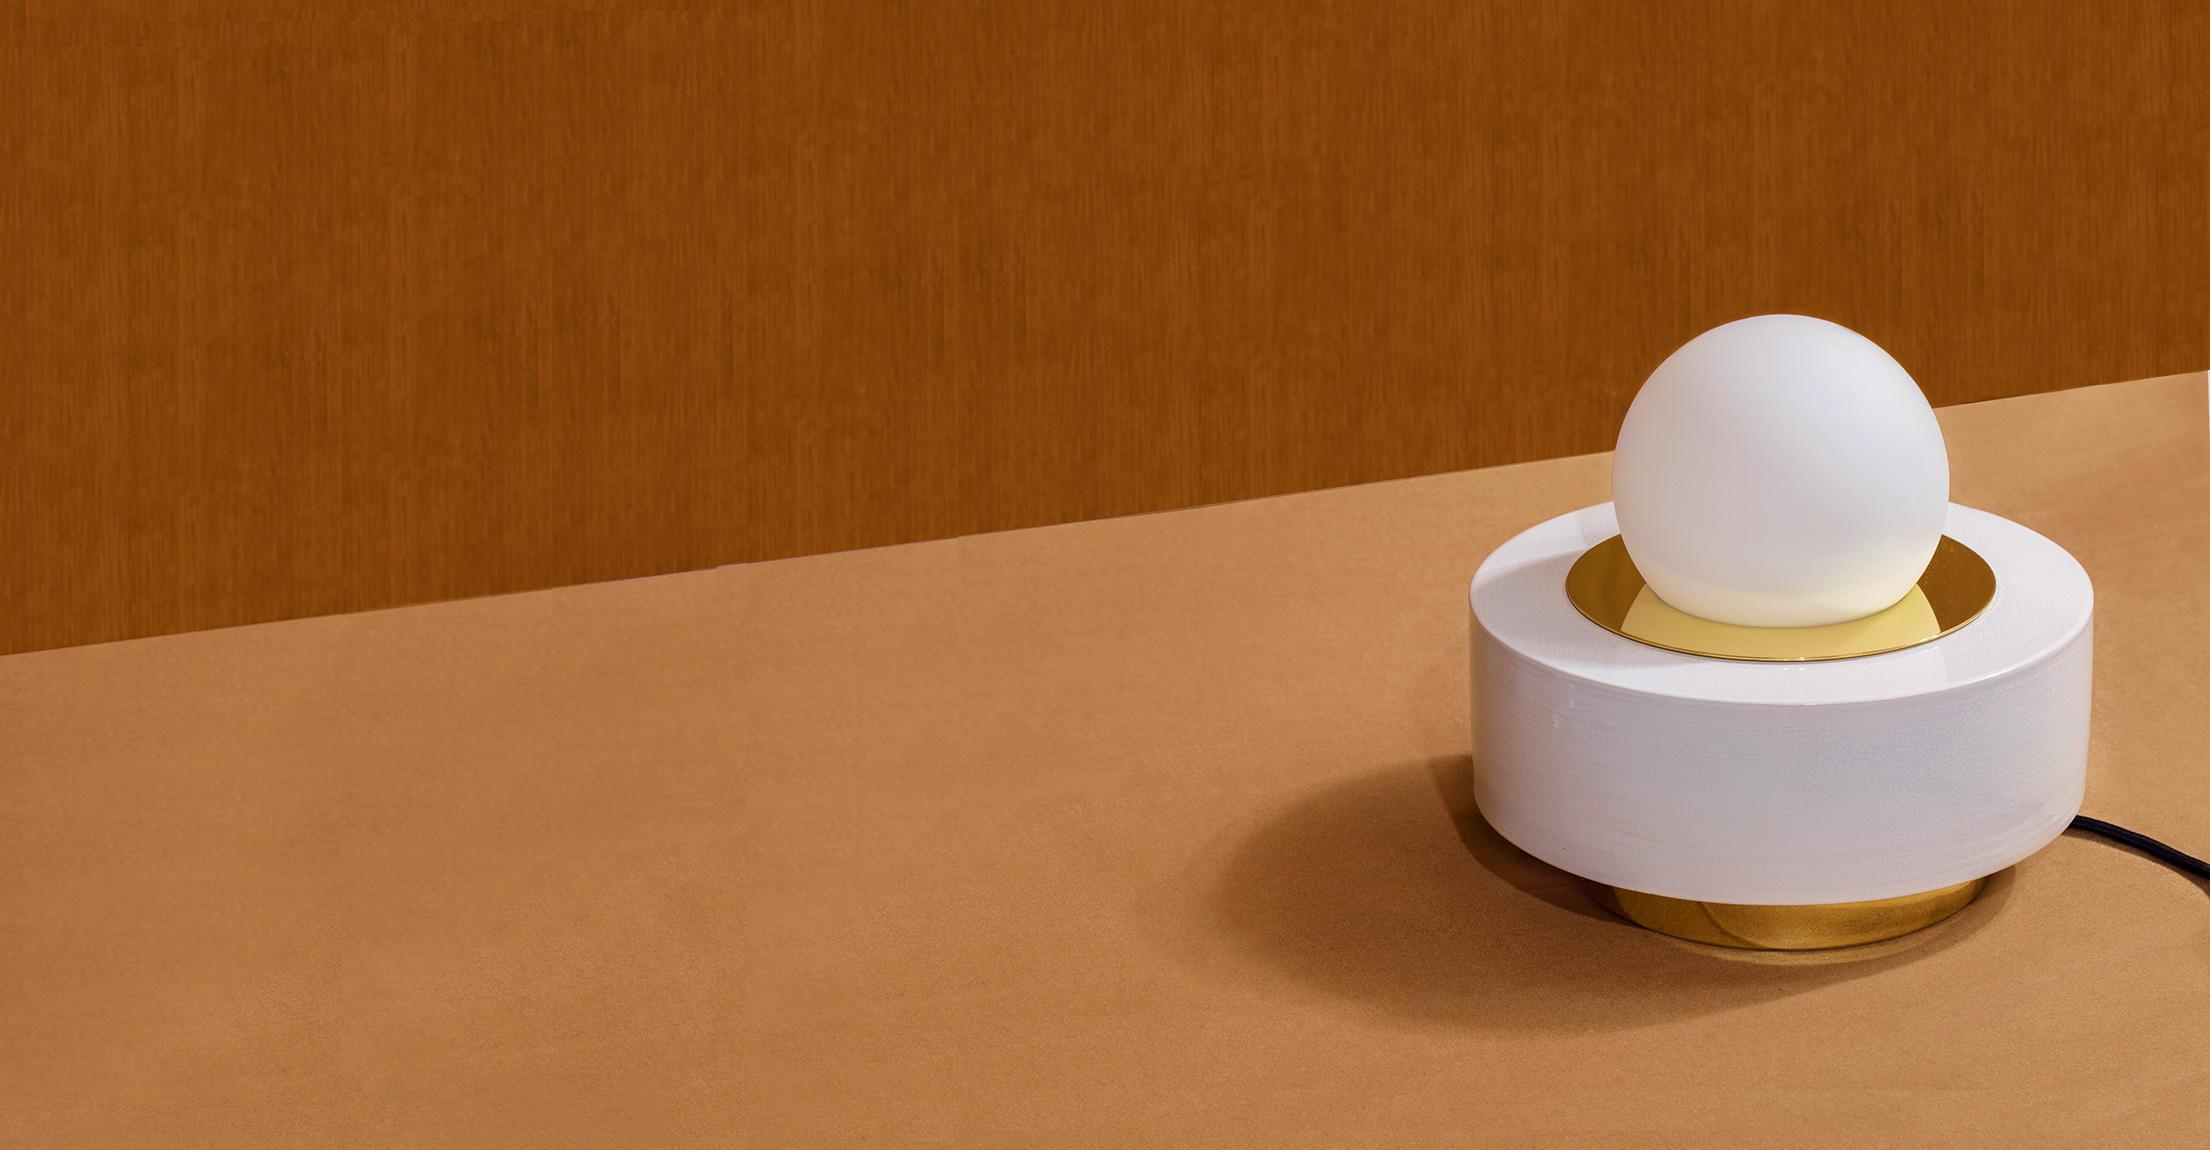 haos-lampe-ceramique-laiton-bandeau7